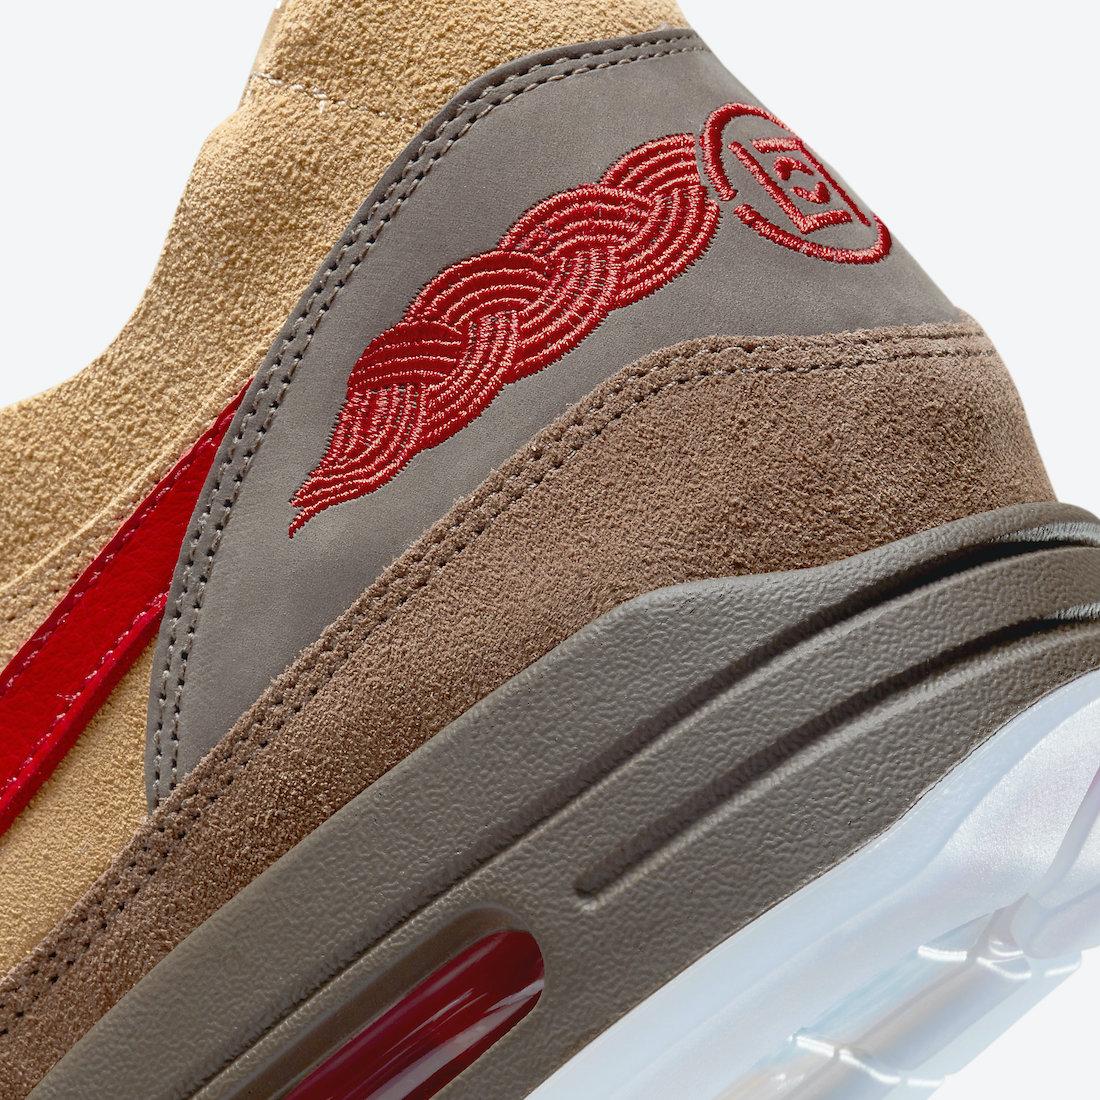 Clot-Nike-Air-Max-1-KOD-CHA-DD1870-200-Release-Date-7